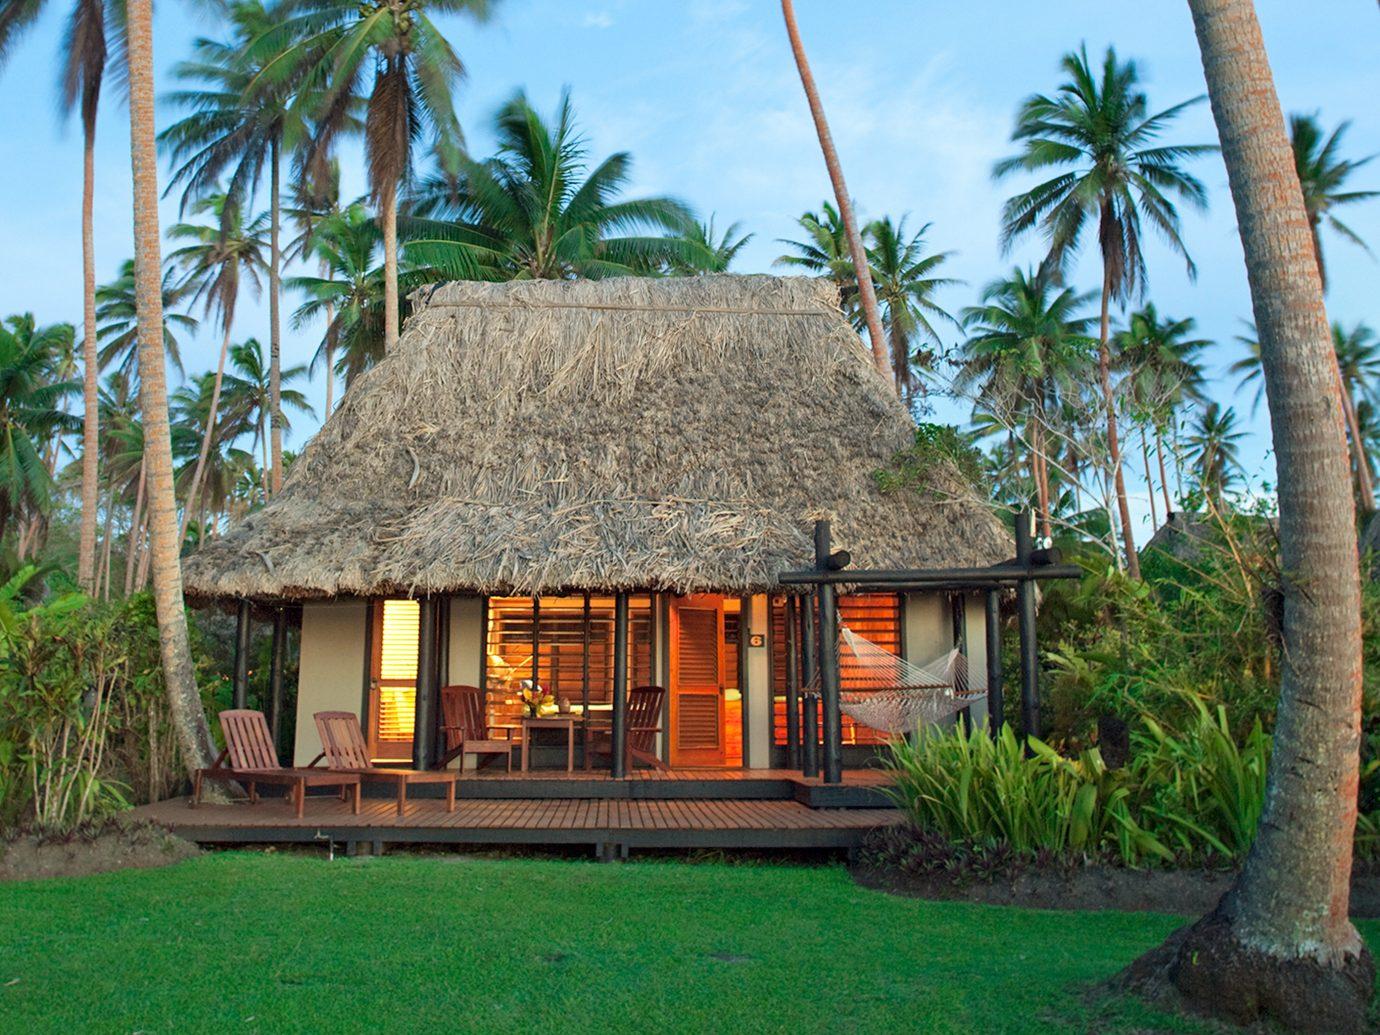 Exterior of a hut at Jean-Michel Cousteau Resort, Fiji